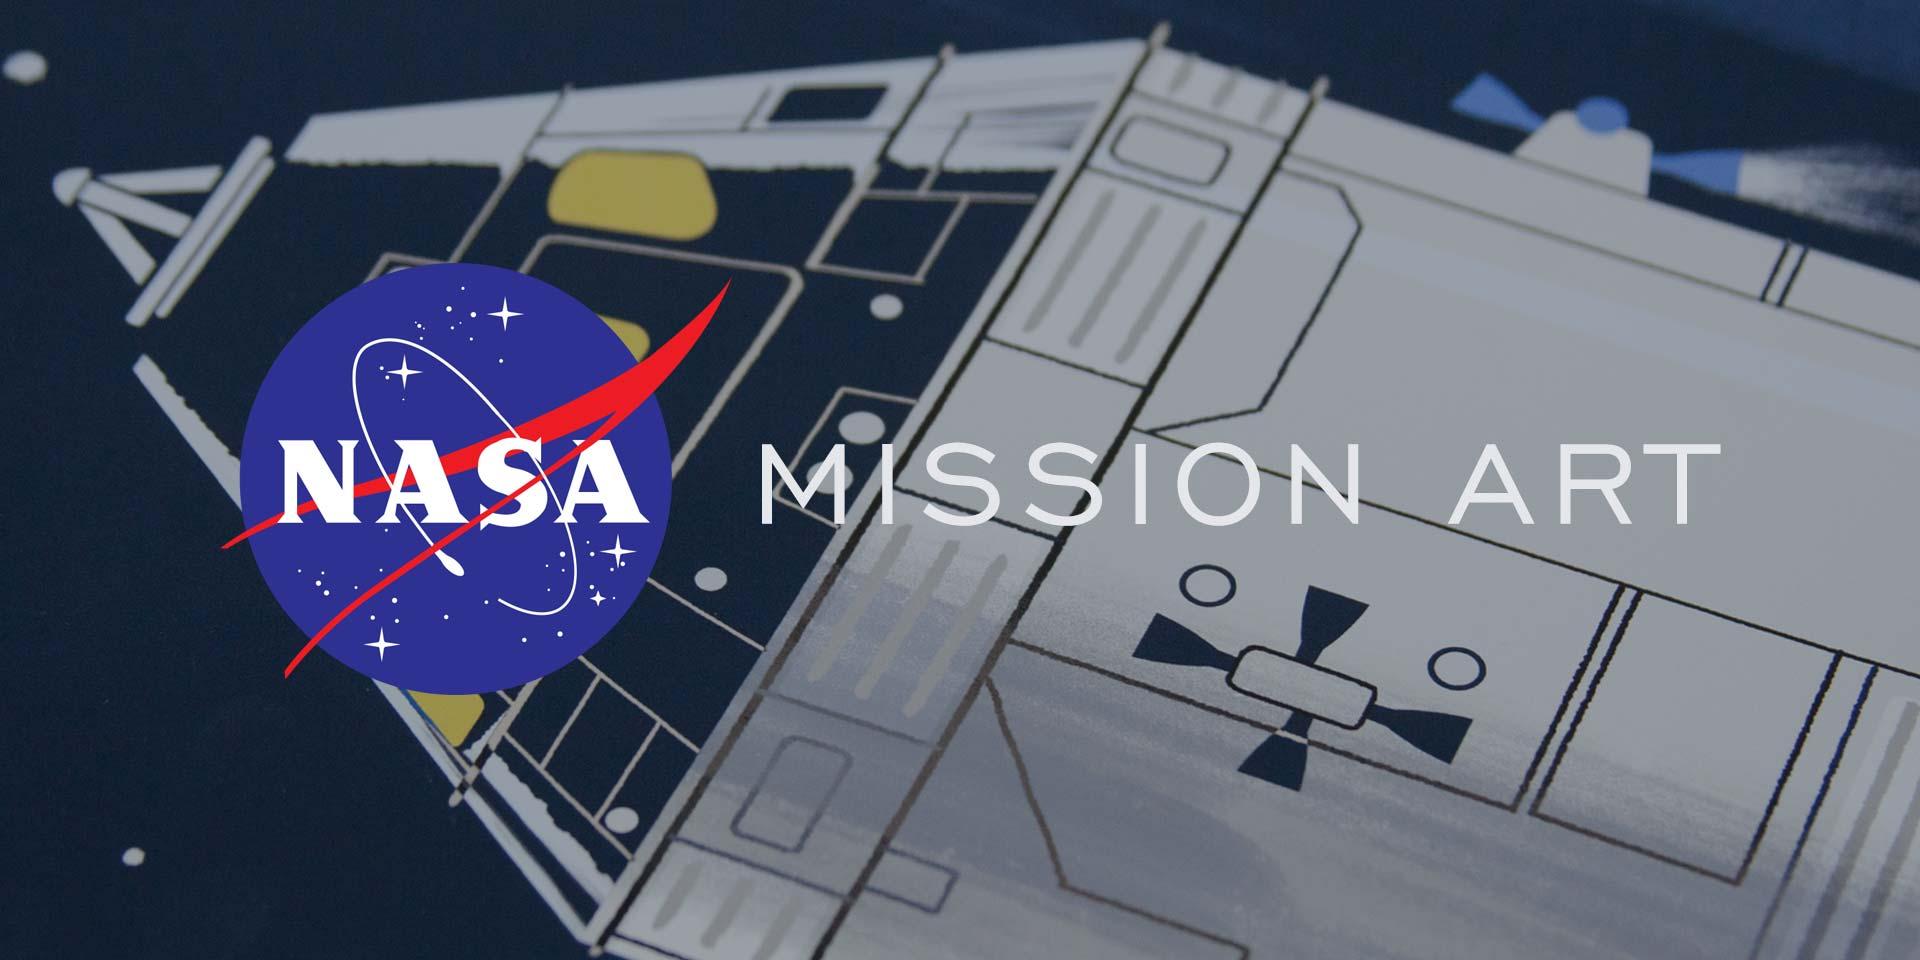 Nasa Mission Art